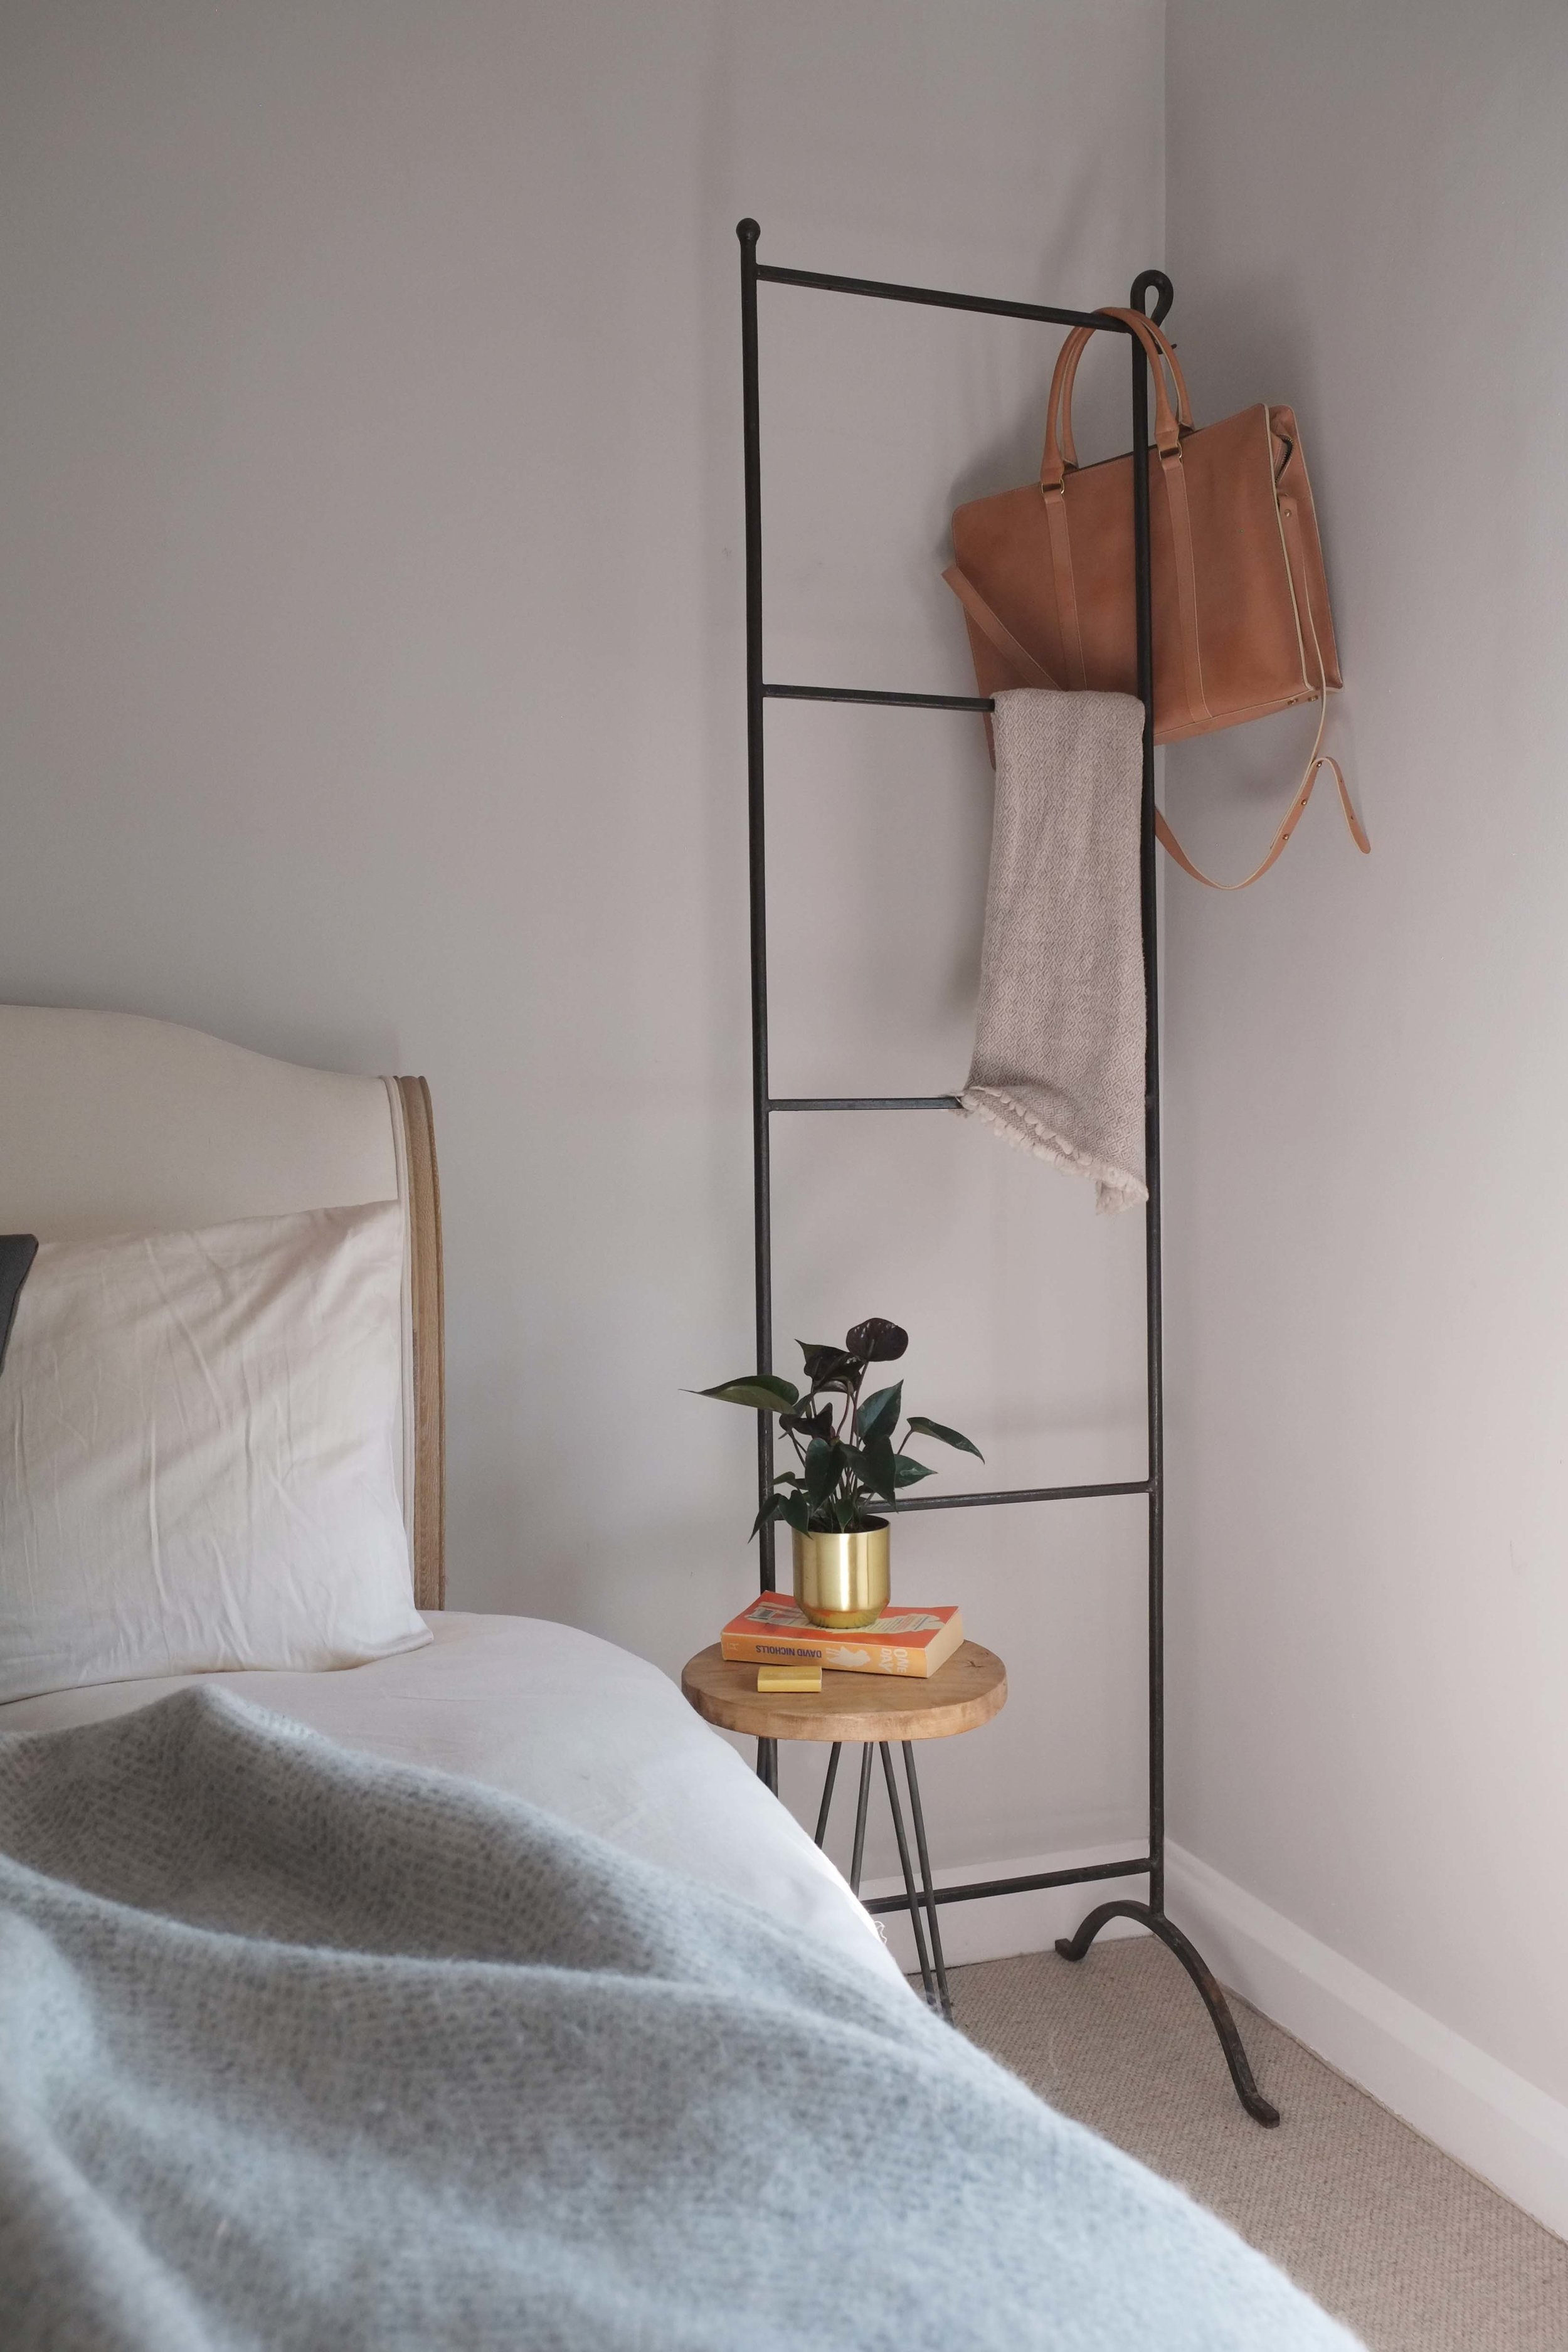 lunarlunar_interior_design_apartment_art_deco_deanhill_bedroom.jpg